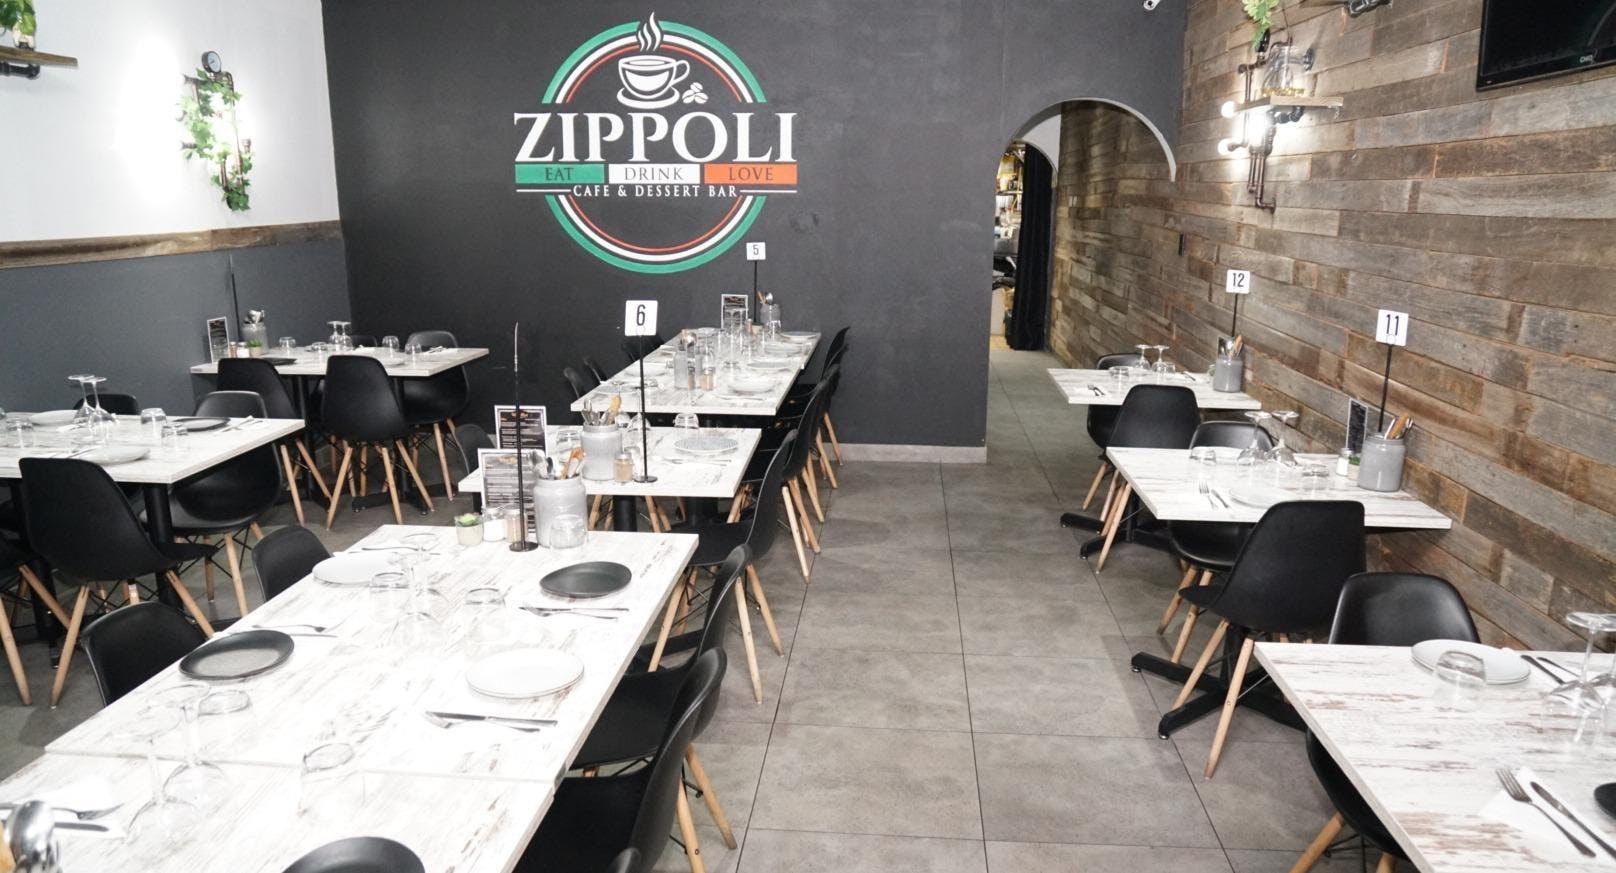 Zippoli